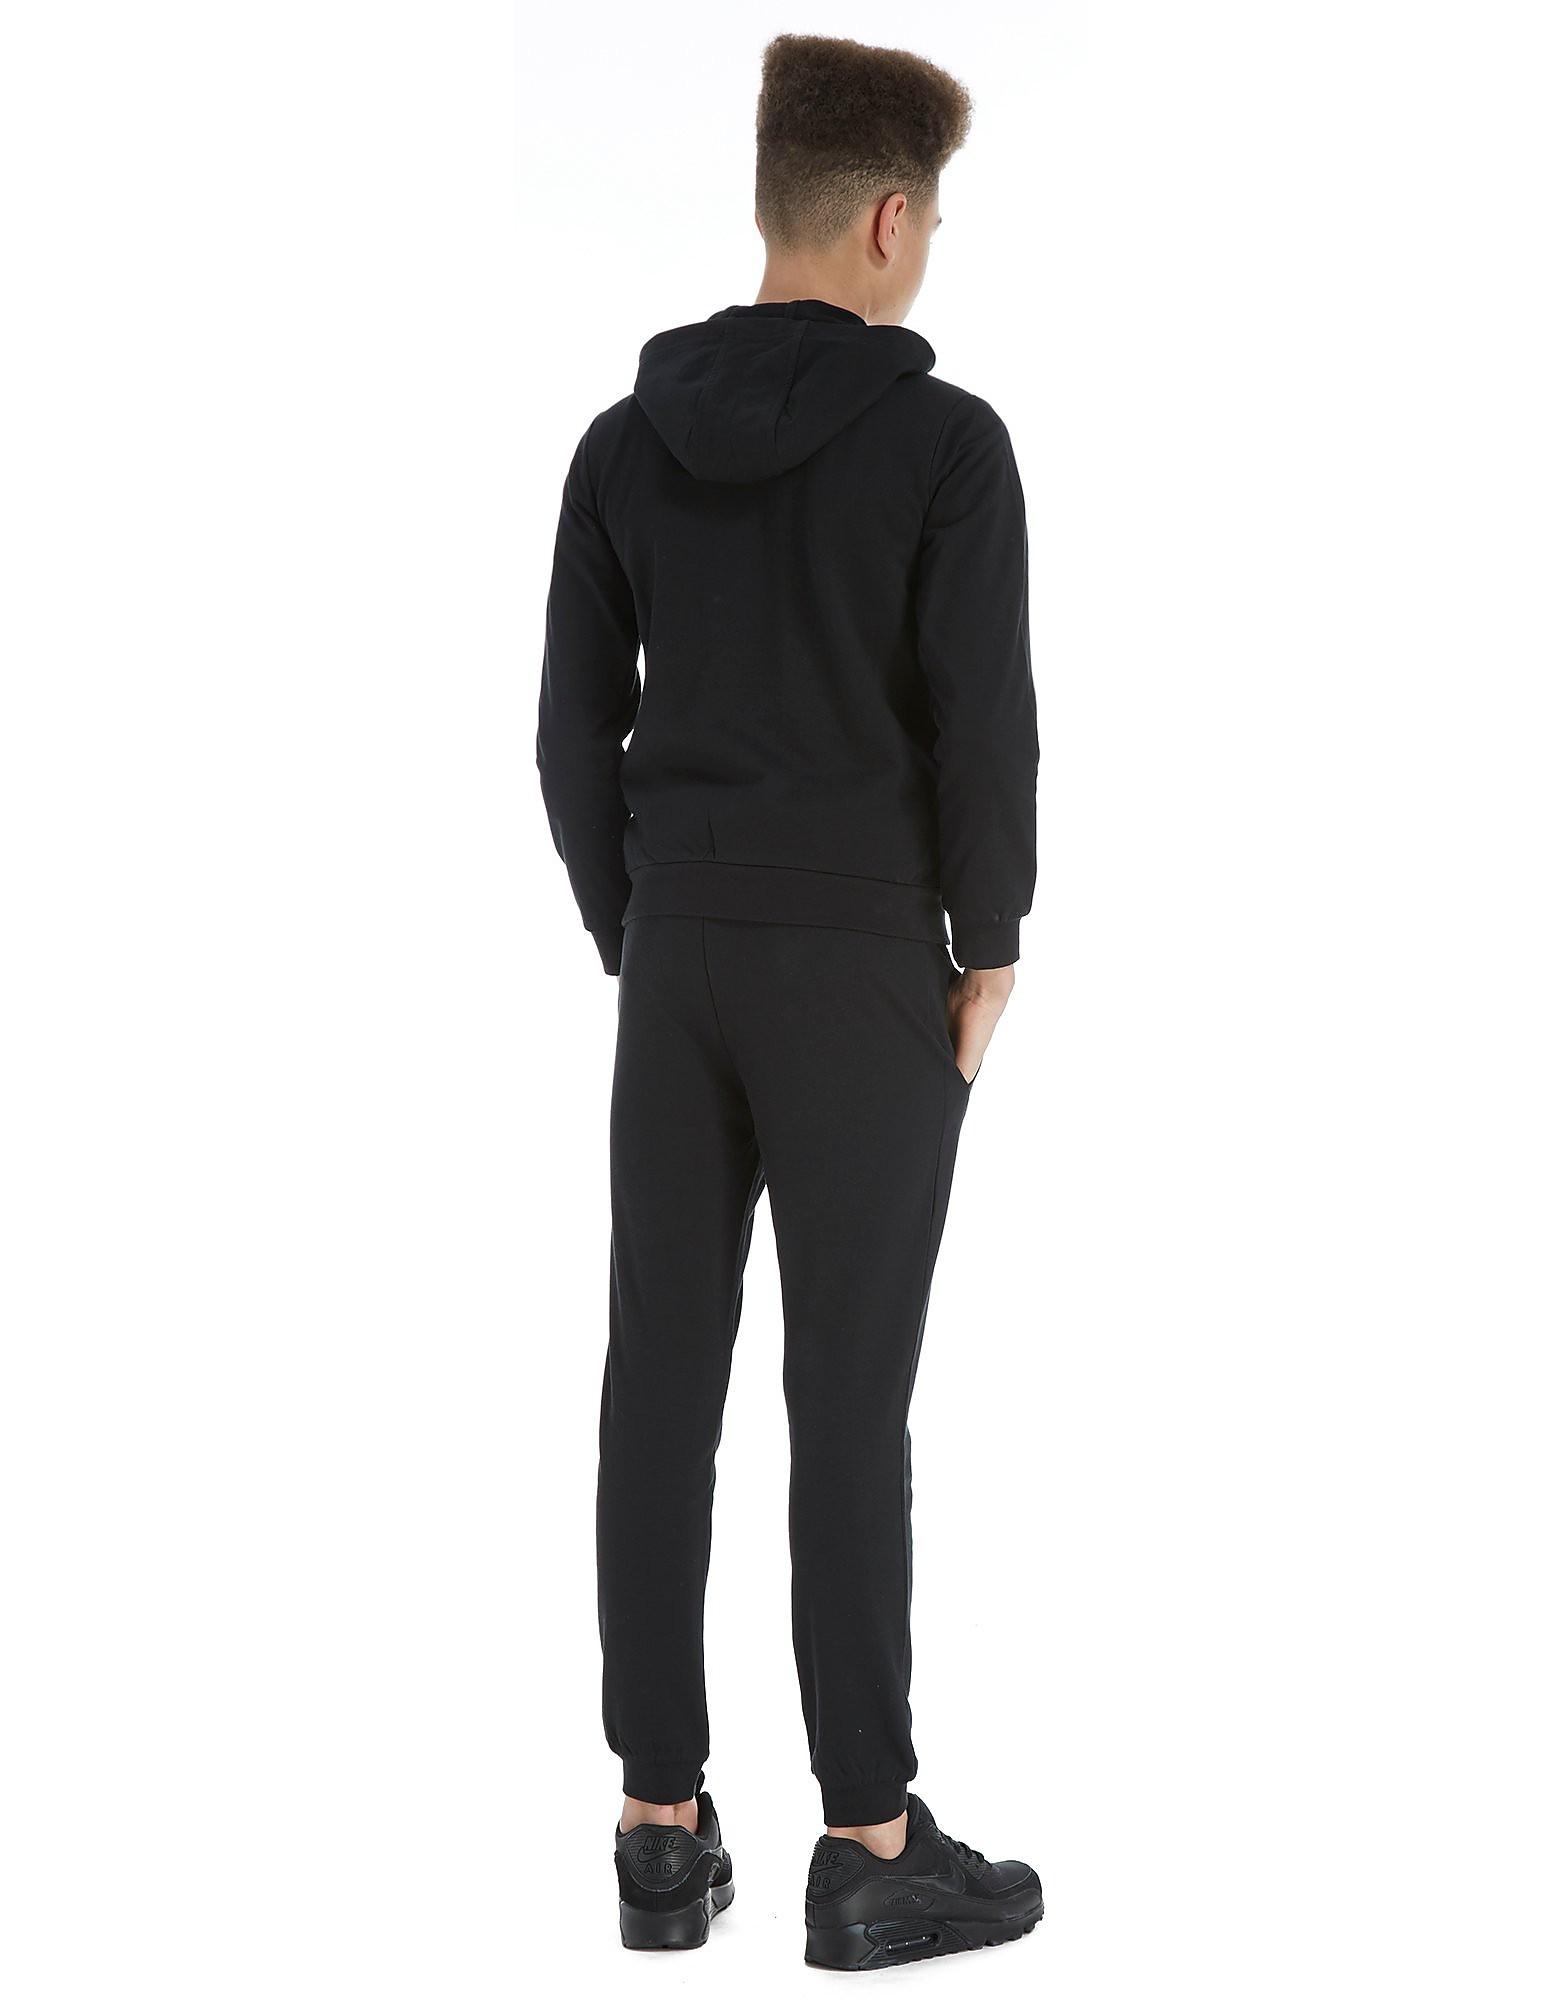 Emporio Armani EA7 Core Fleece Full Zip Suit Junior